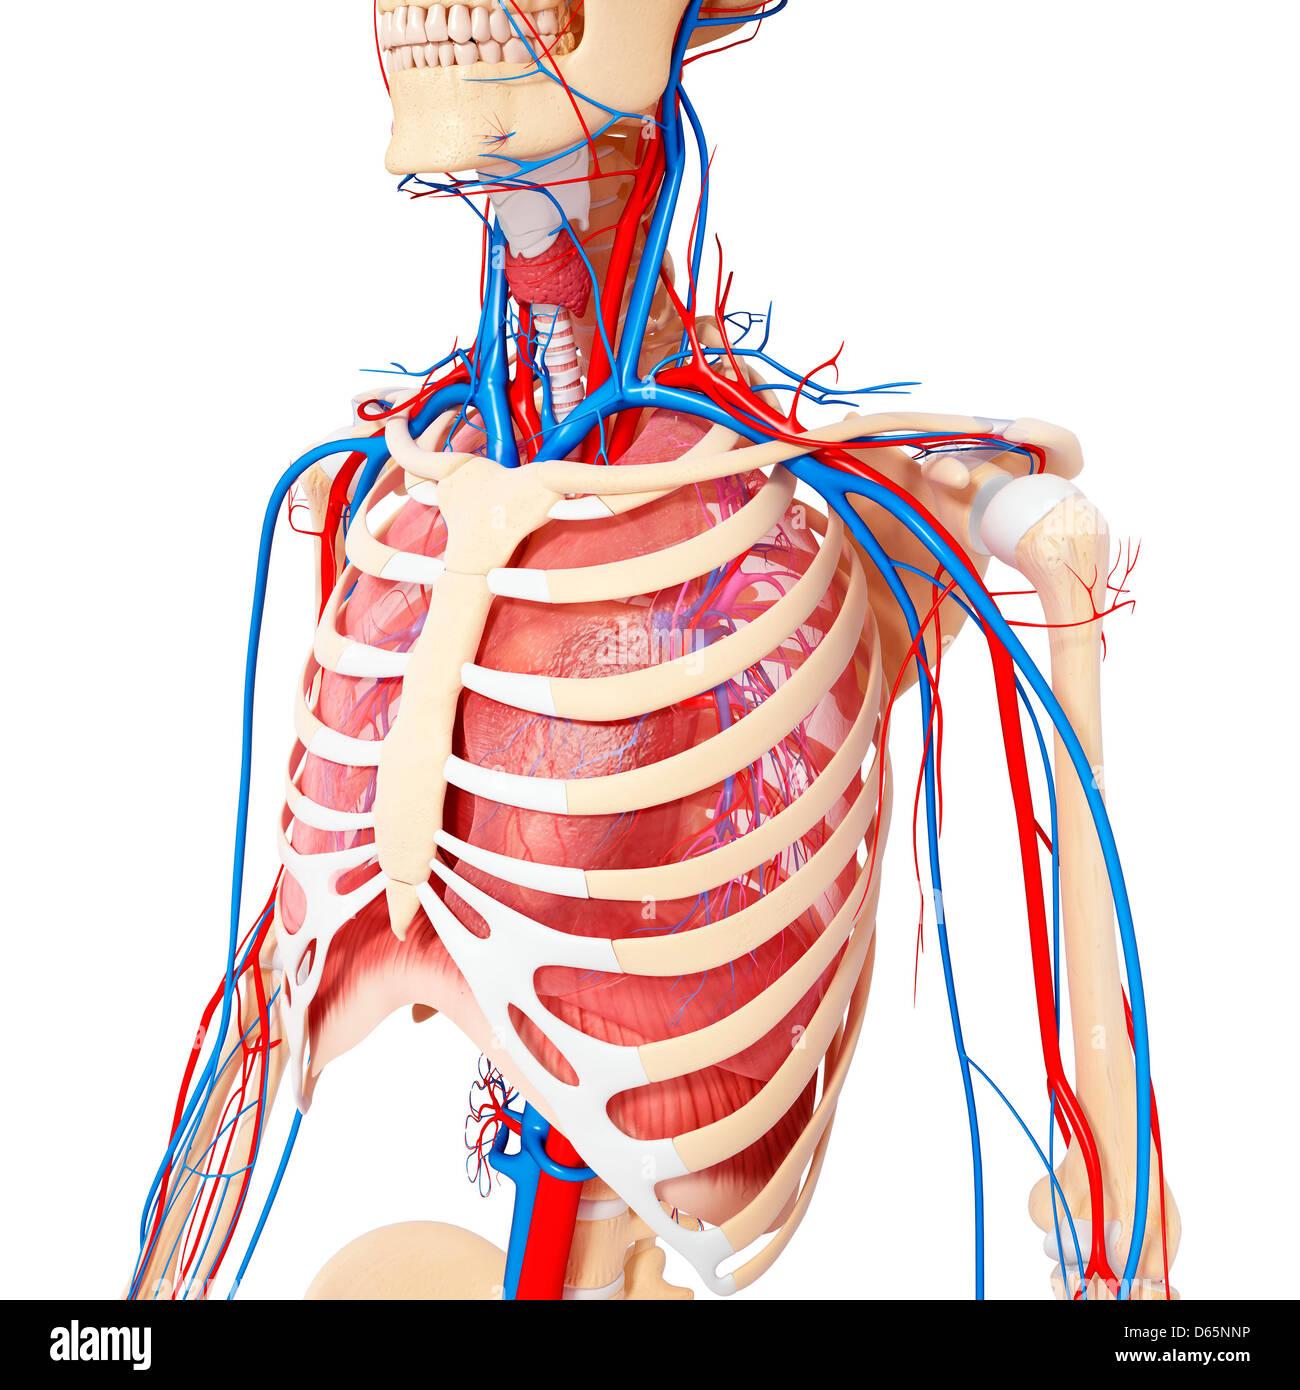 Brust-Anatomie, artwork Stockfoto, Bild: 55445874 - Alamy